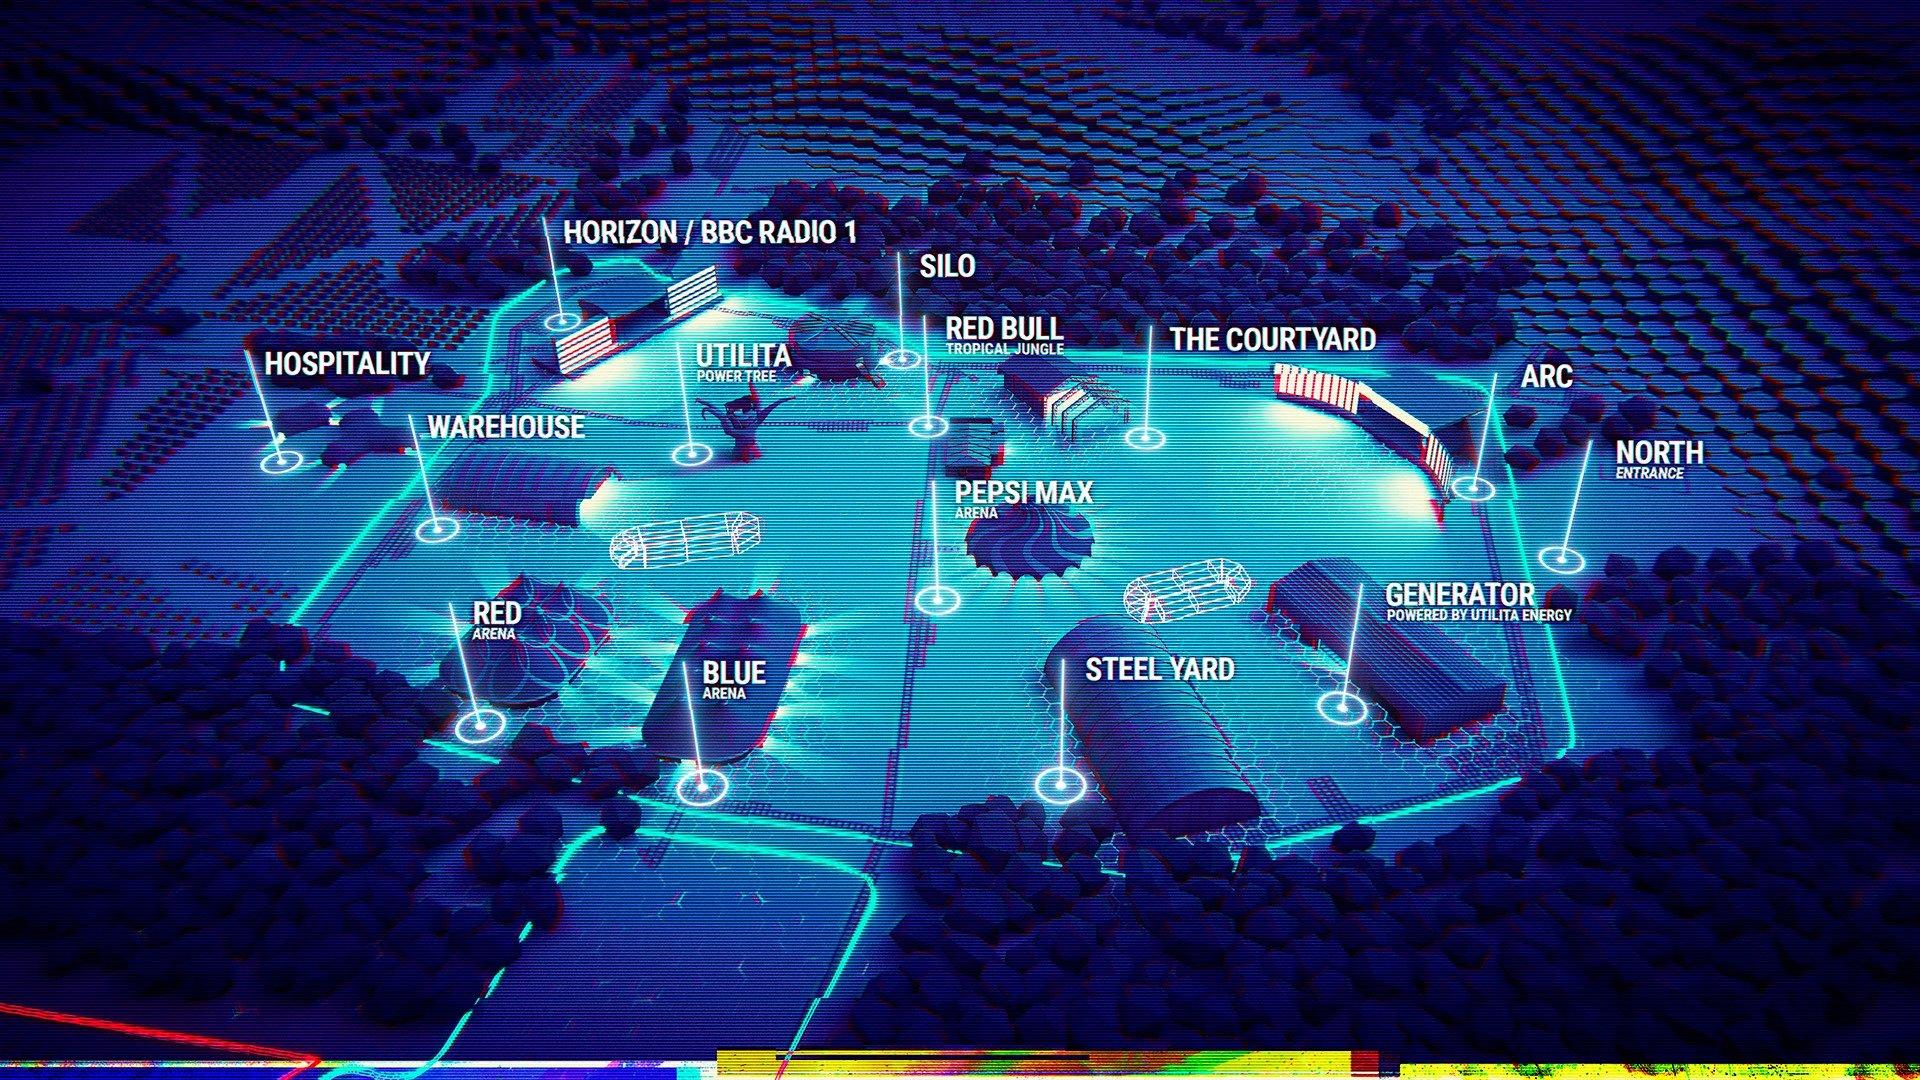 Creamfields 2019 map